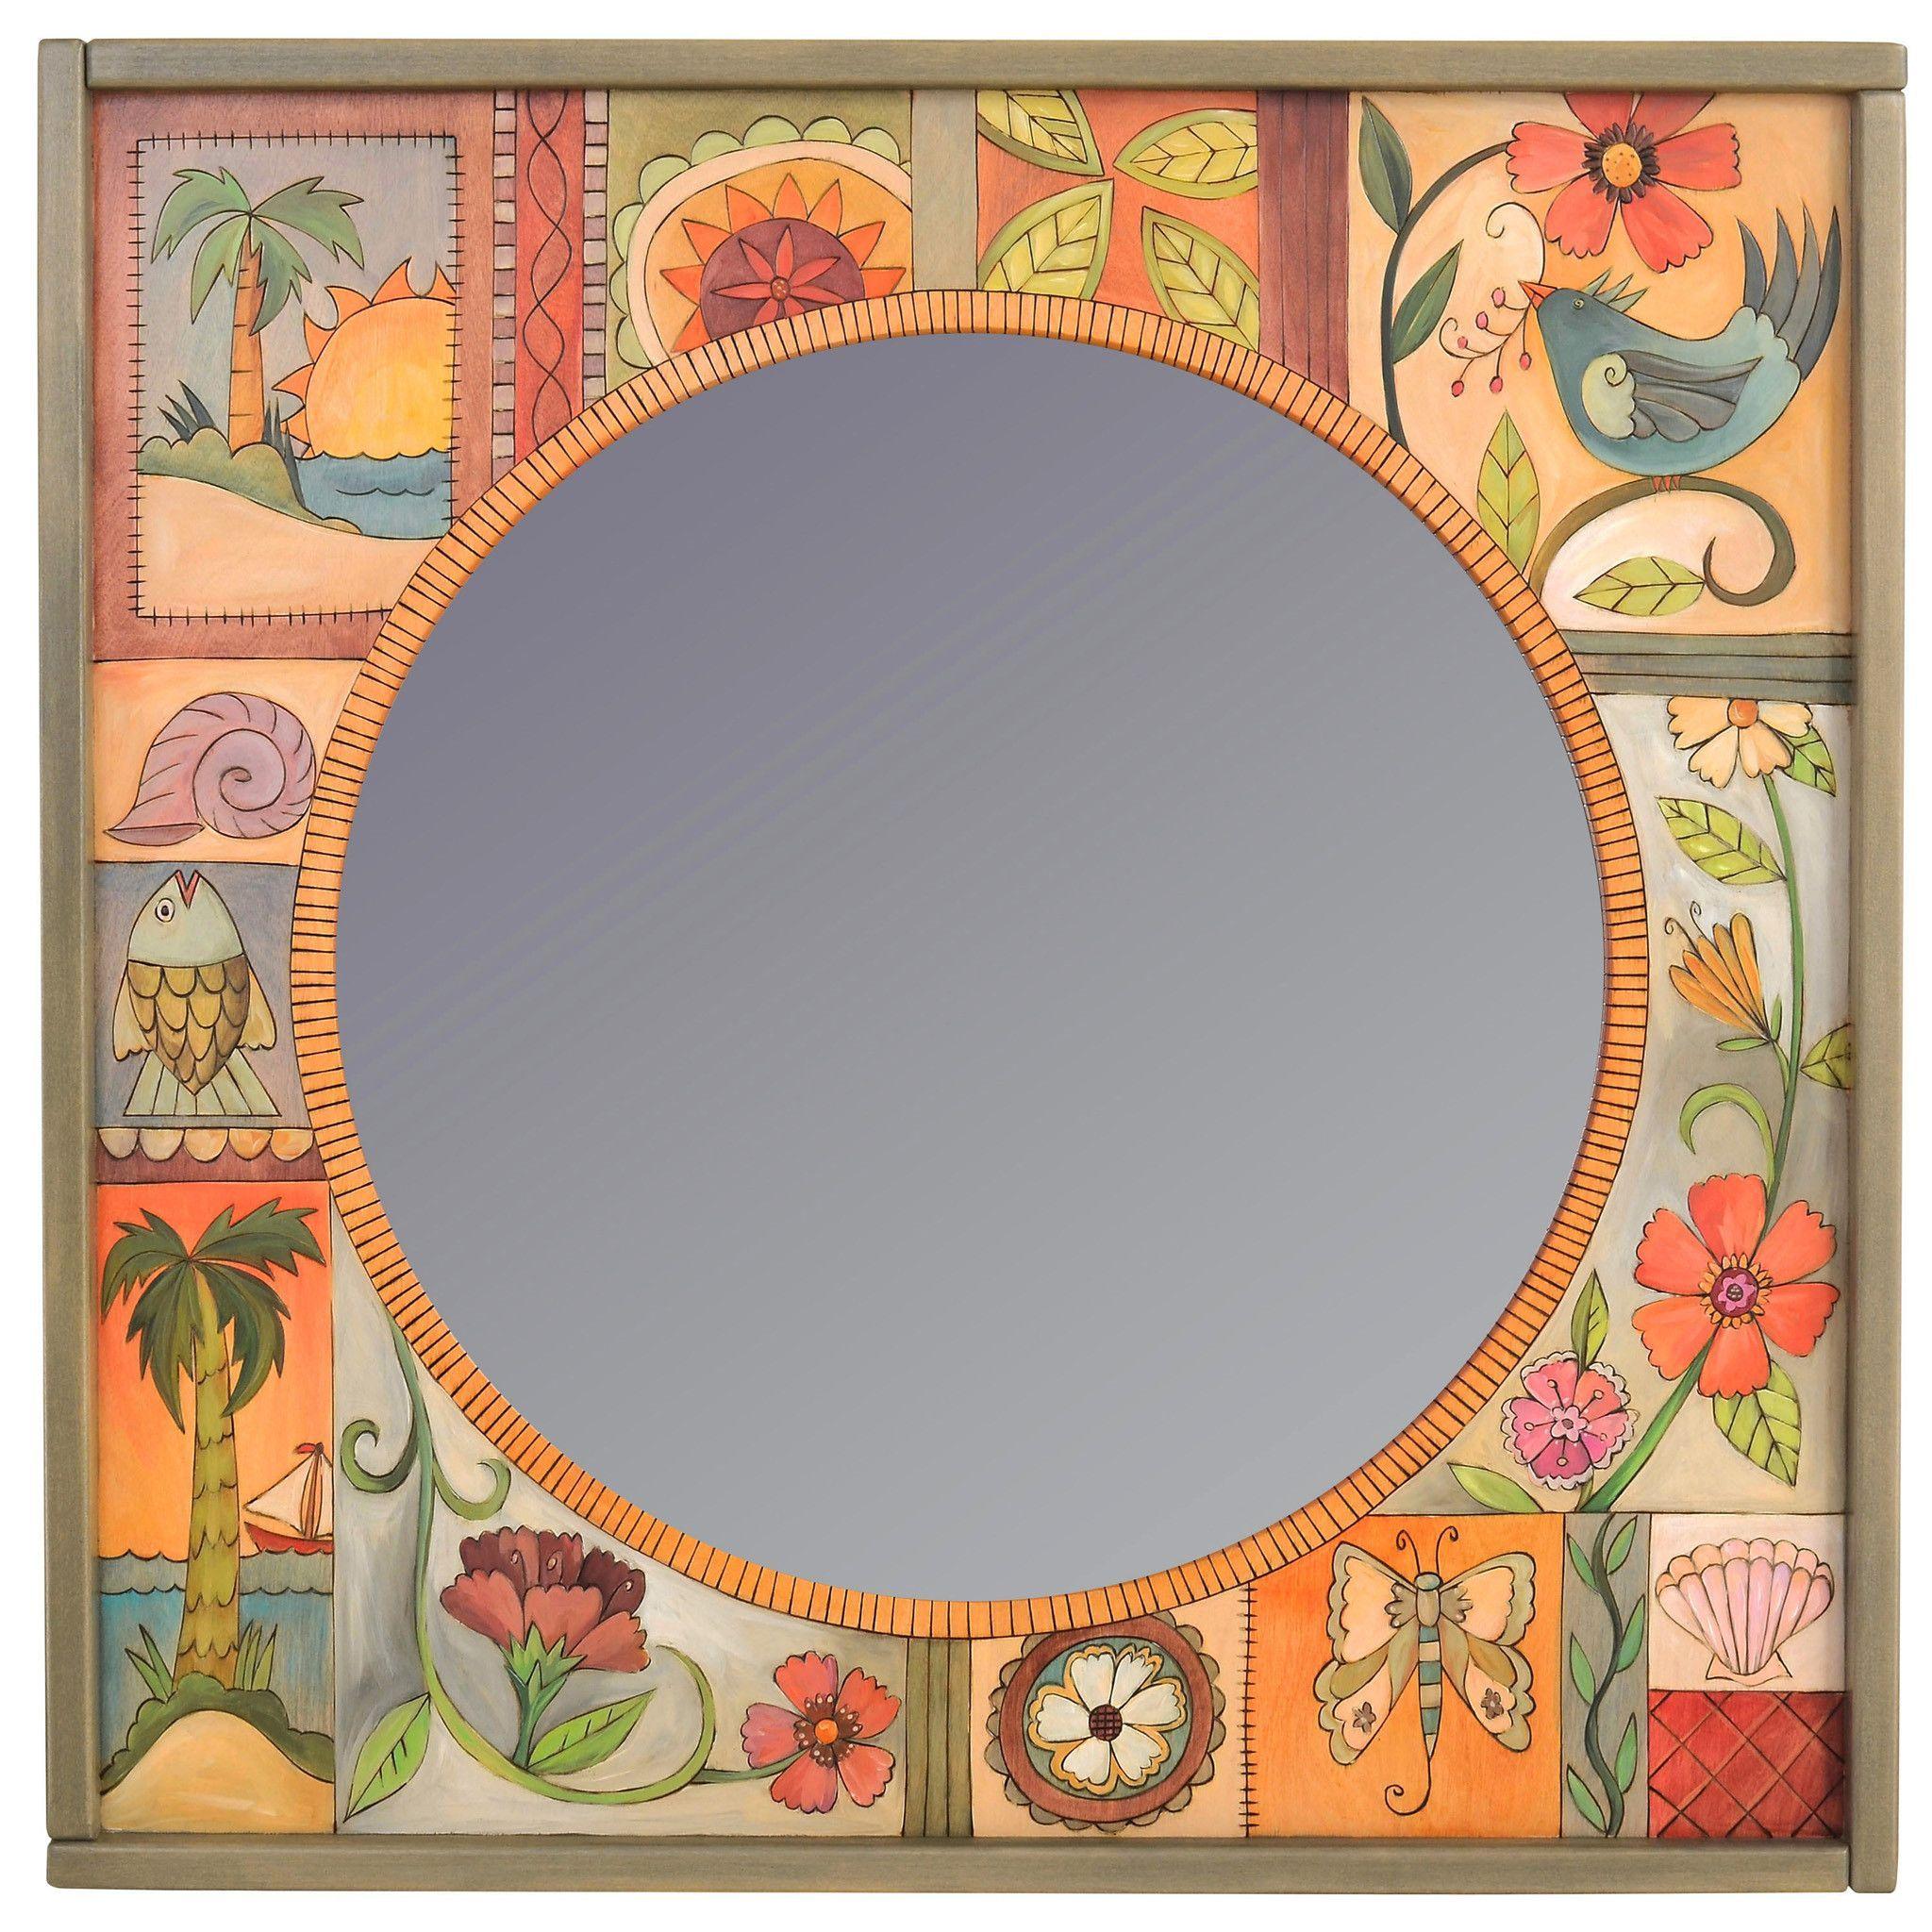 Square Framed Circular Mirror By Sticks Mir038 D75459 Circular Mirror Arts Crafts Furniture Mirror